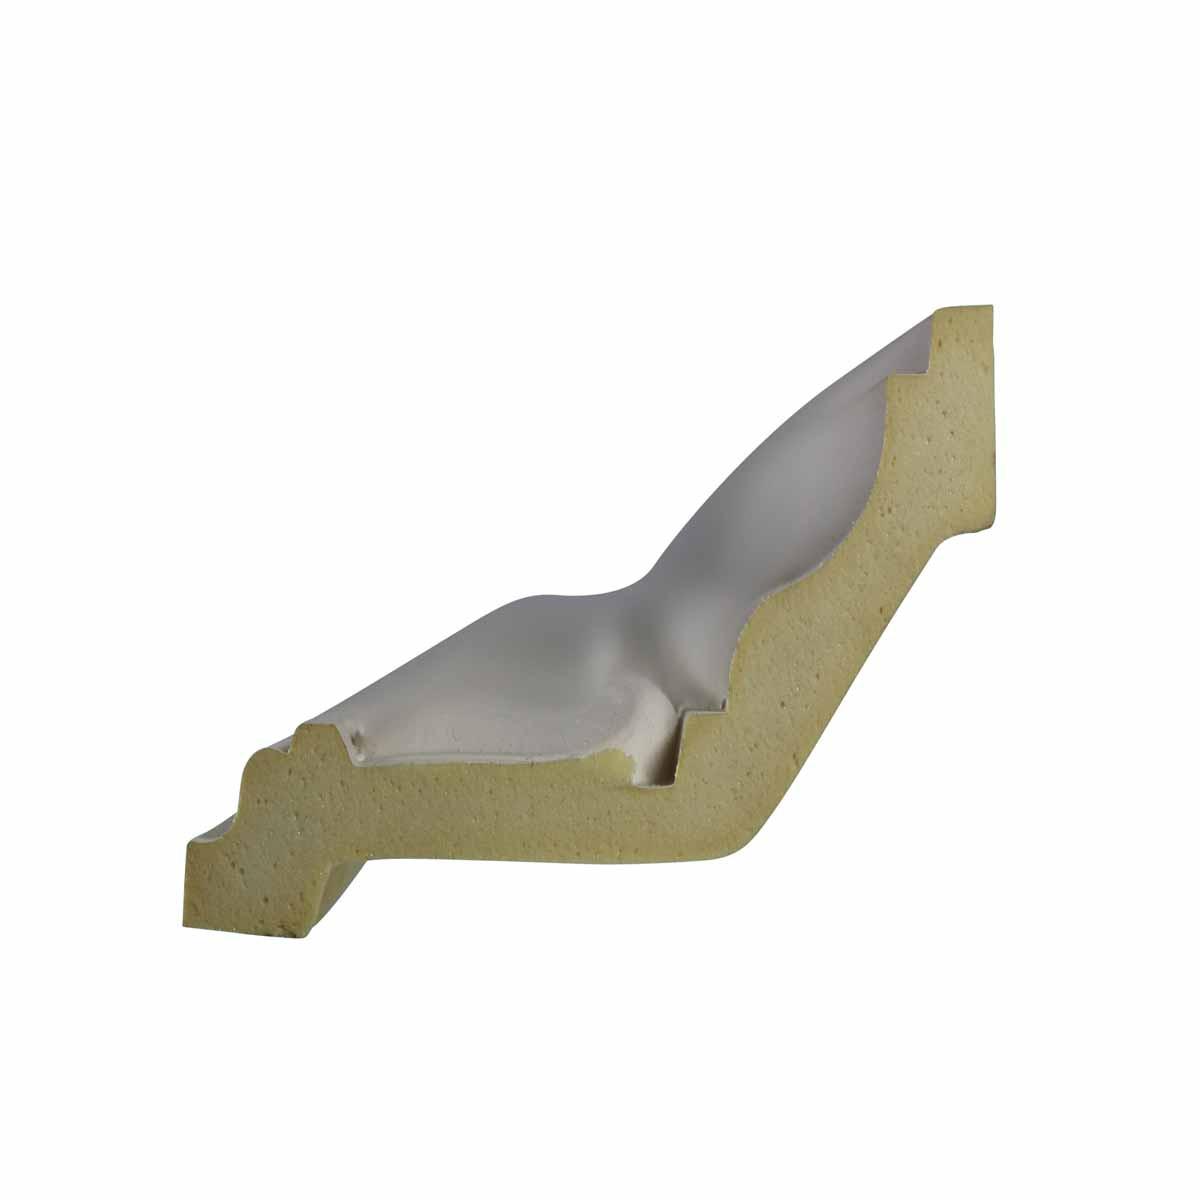 Cornice White Urethane Sample of 11351 24 Long Cornice Cornice Moulding Cornice Molding